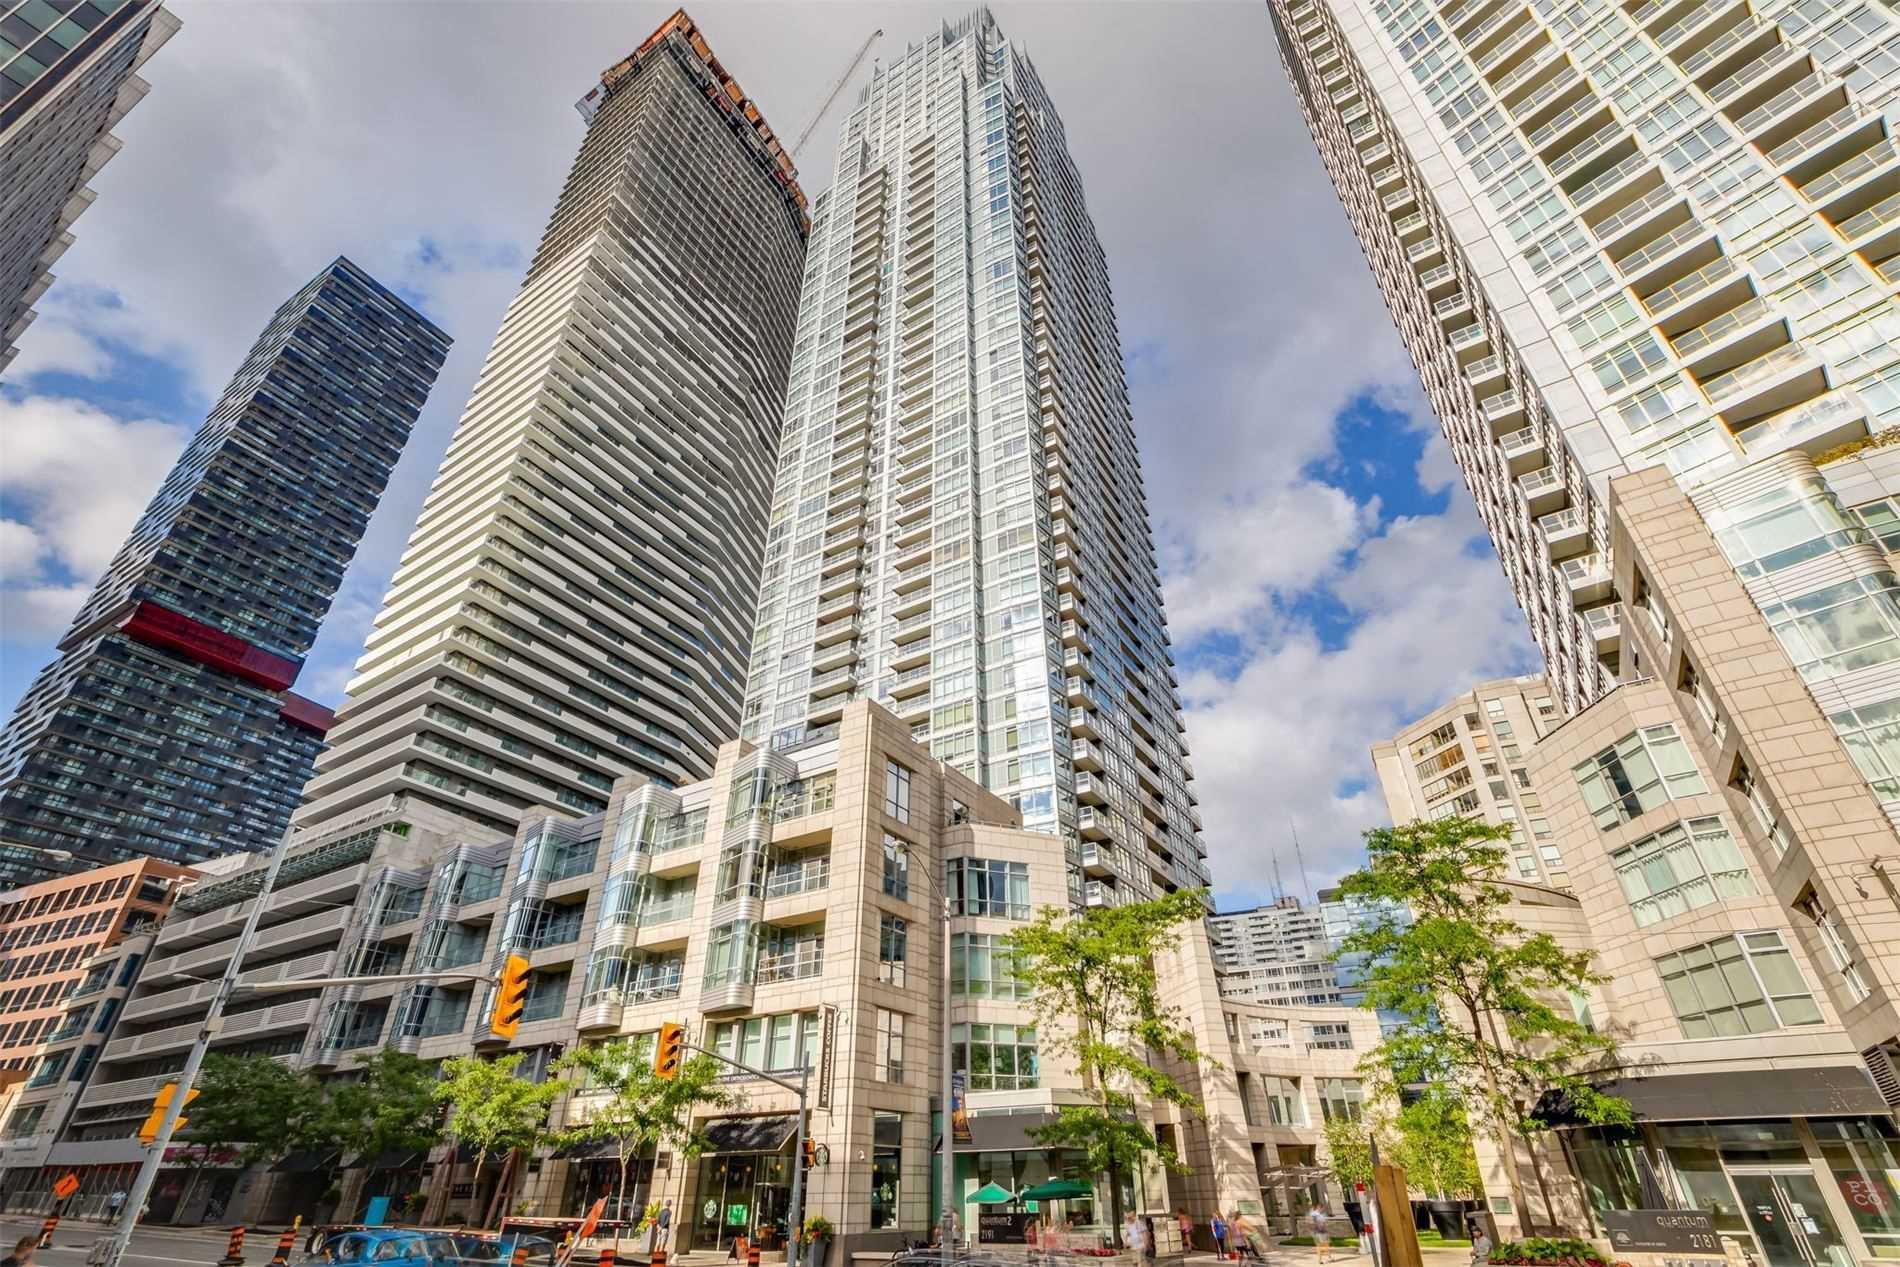 Main Photo: 2906 2191 Yonge Street in Toronto: Mount Pleasant West Condo for sale (Toronto C10)  : MLS®# C4832337